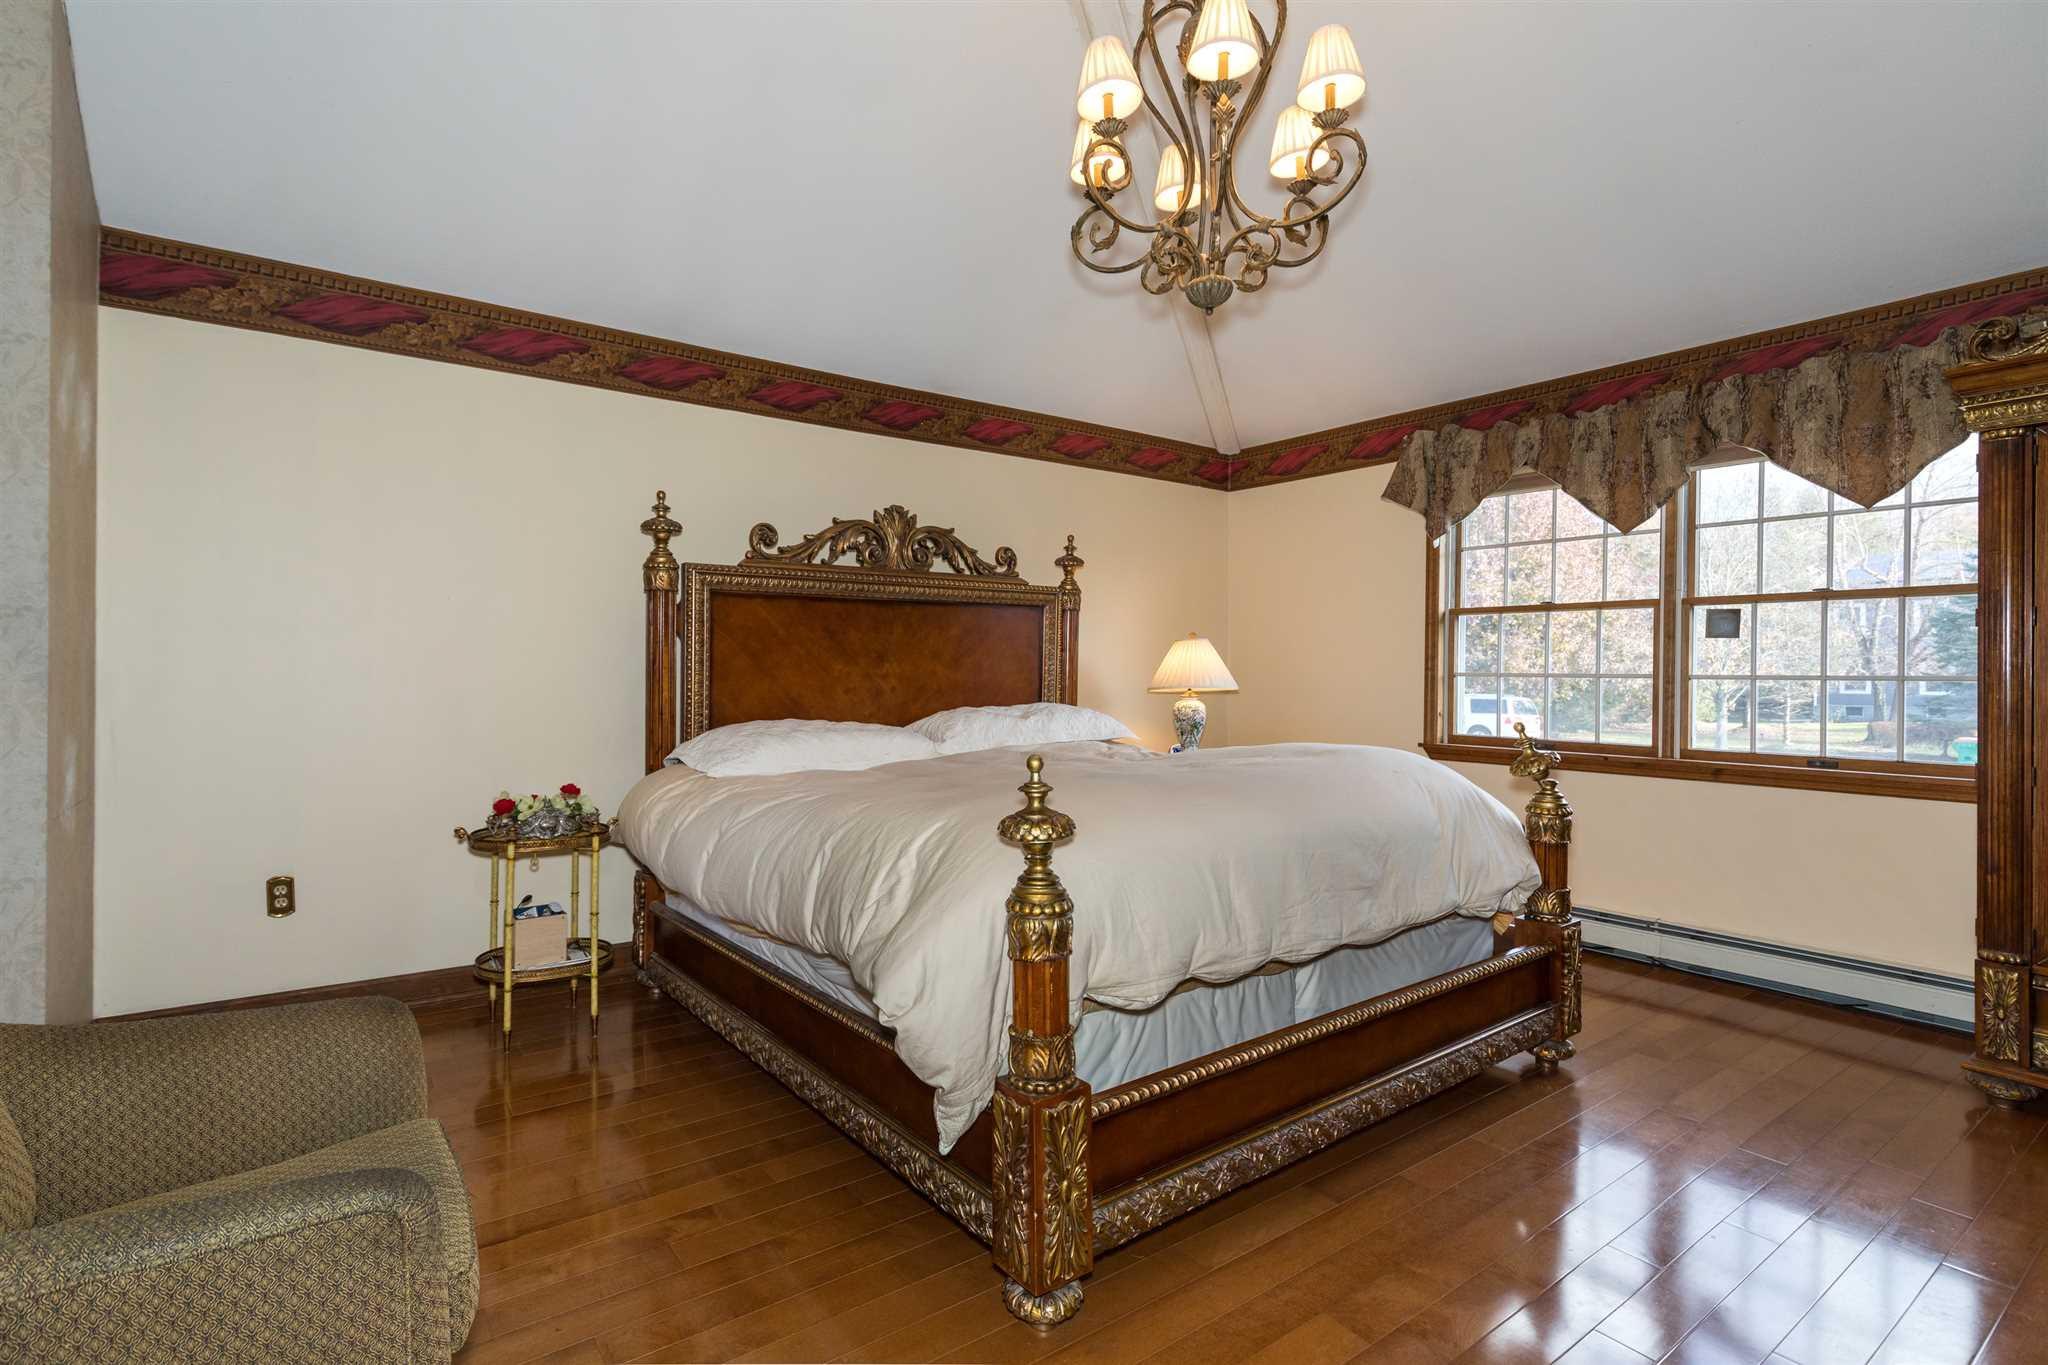 Additional photo for property listing at 66 SADDLE RIDGE Drive 66 SADDLE RIDGE Drive East Fishkill, New York 12533 United States